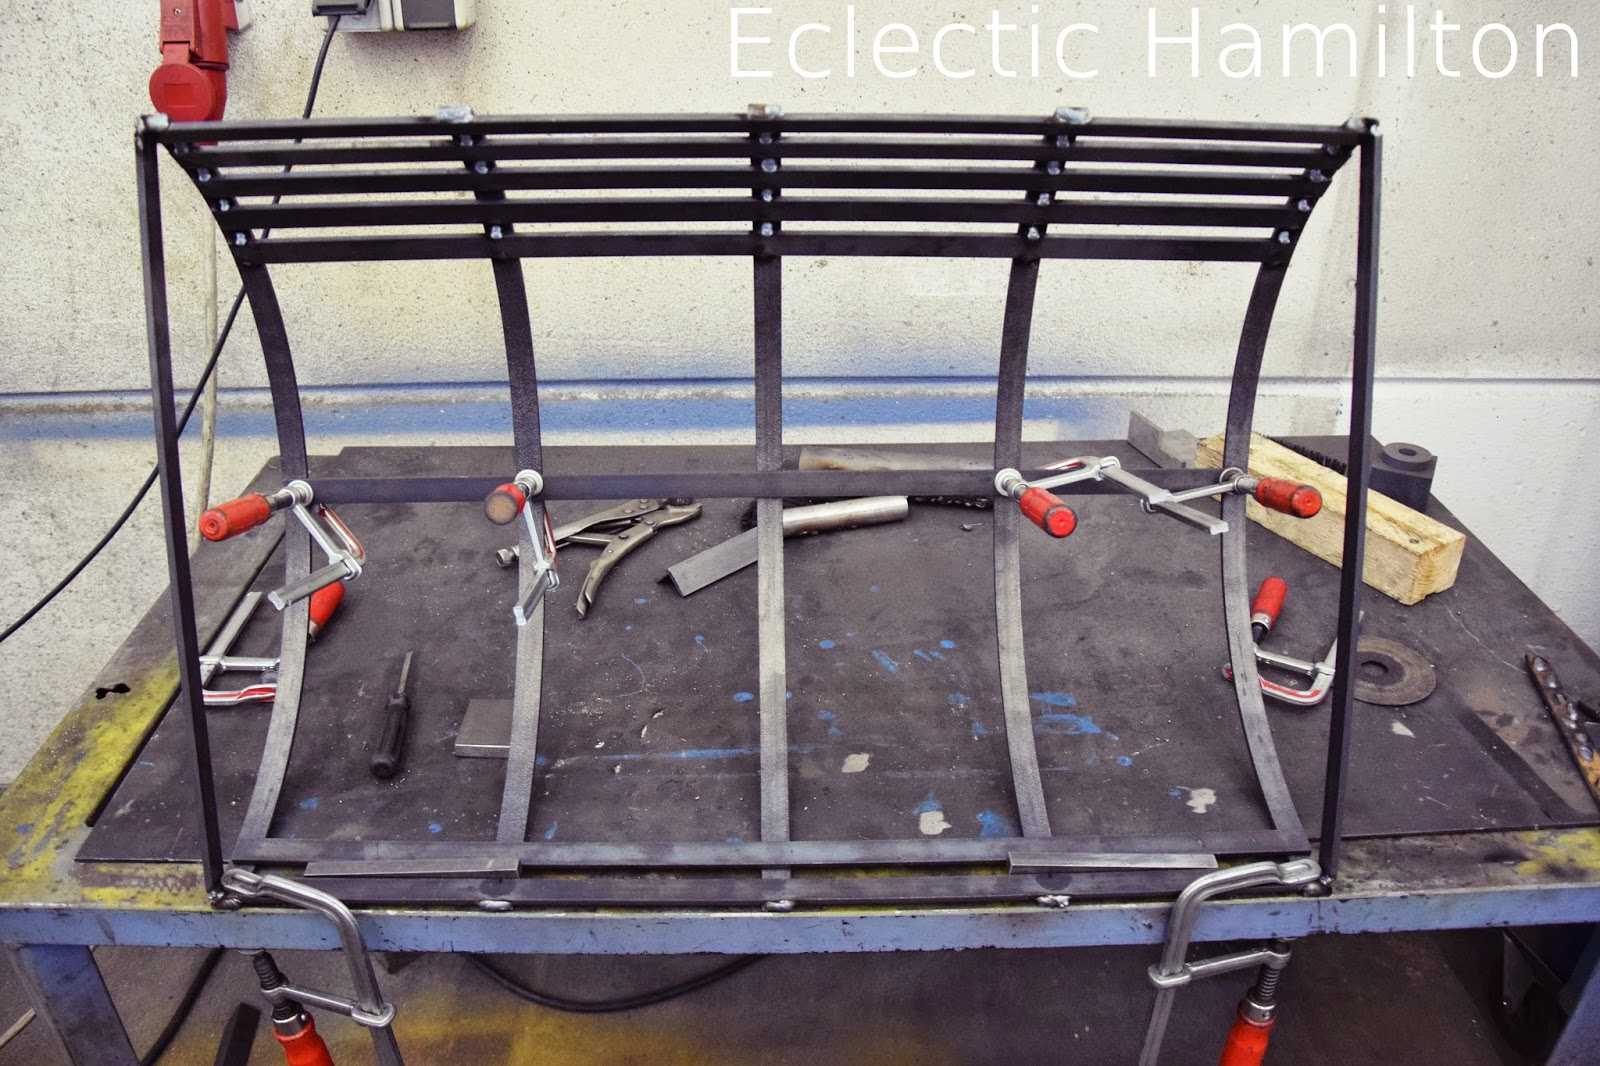 feuerkorb light my fire eclectic hamilton. Black Bedroom Furniture Sets. Home Design Ideas